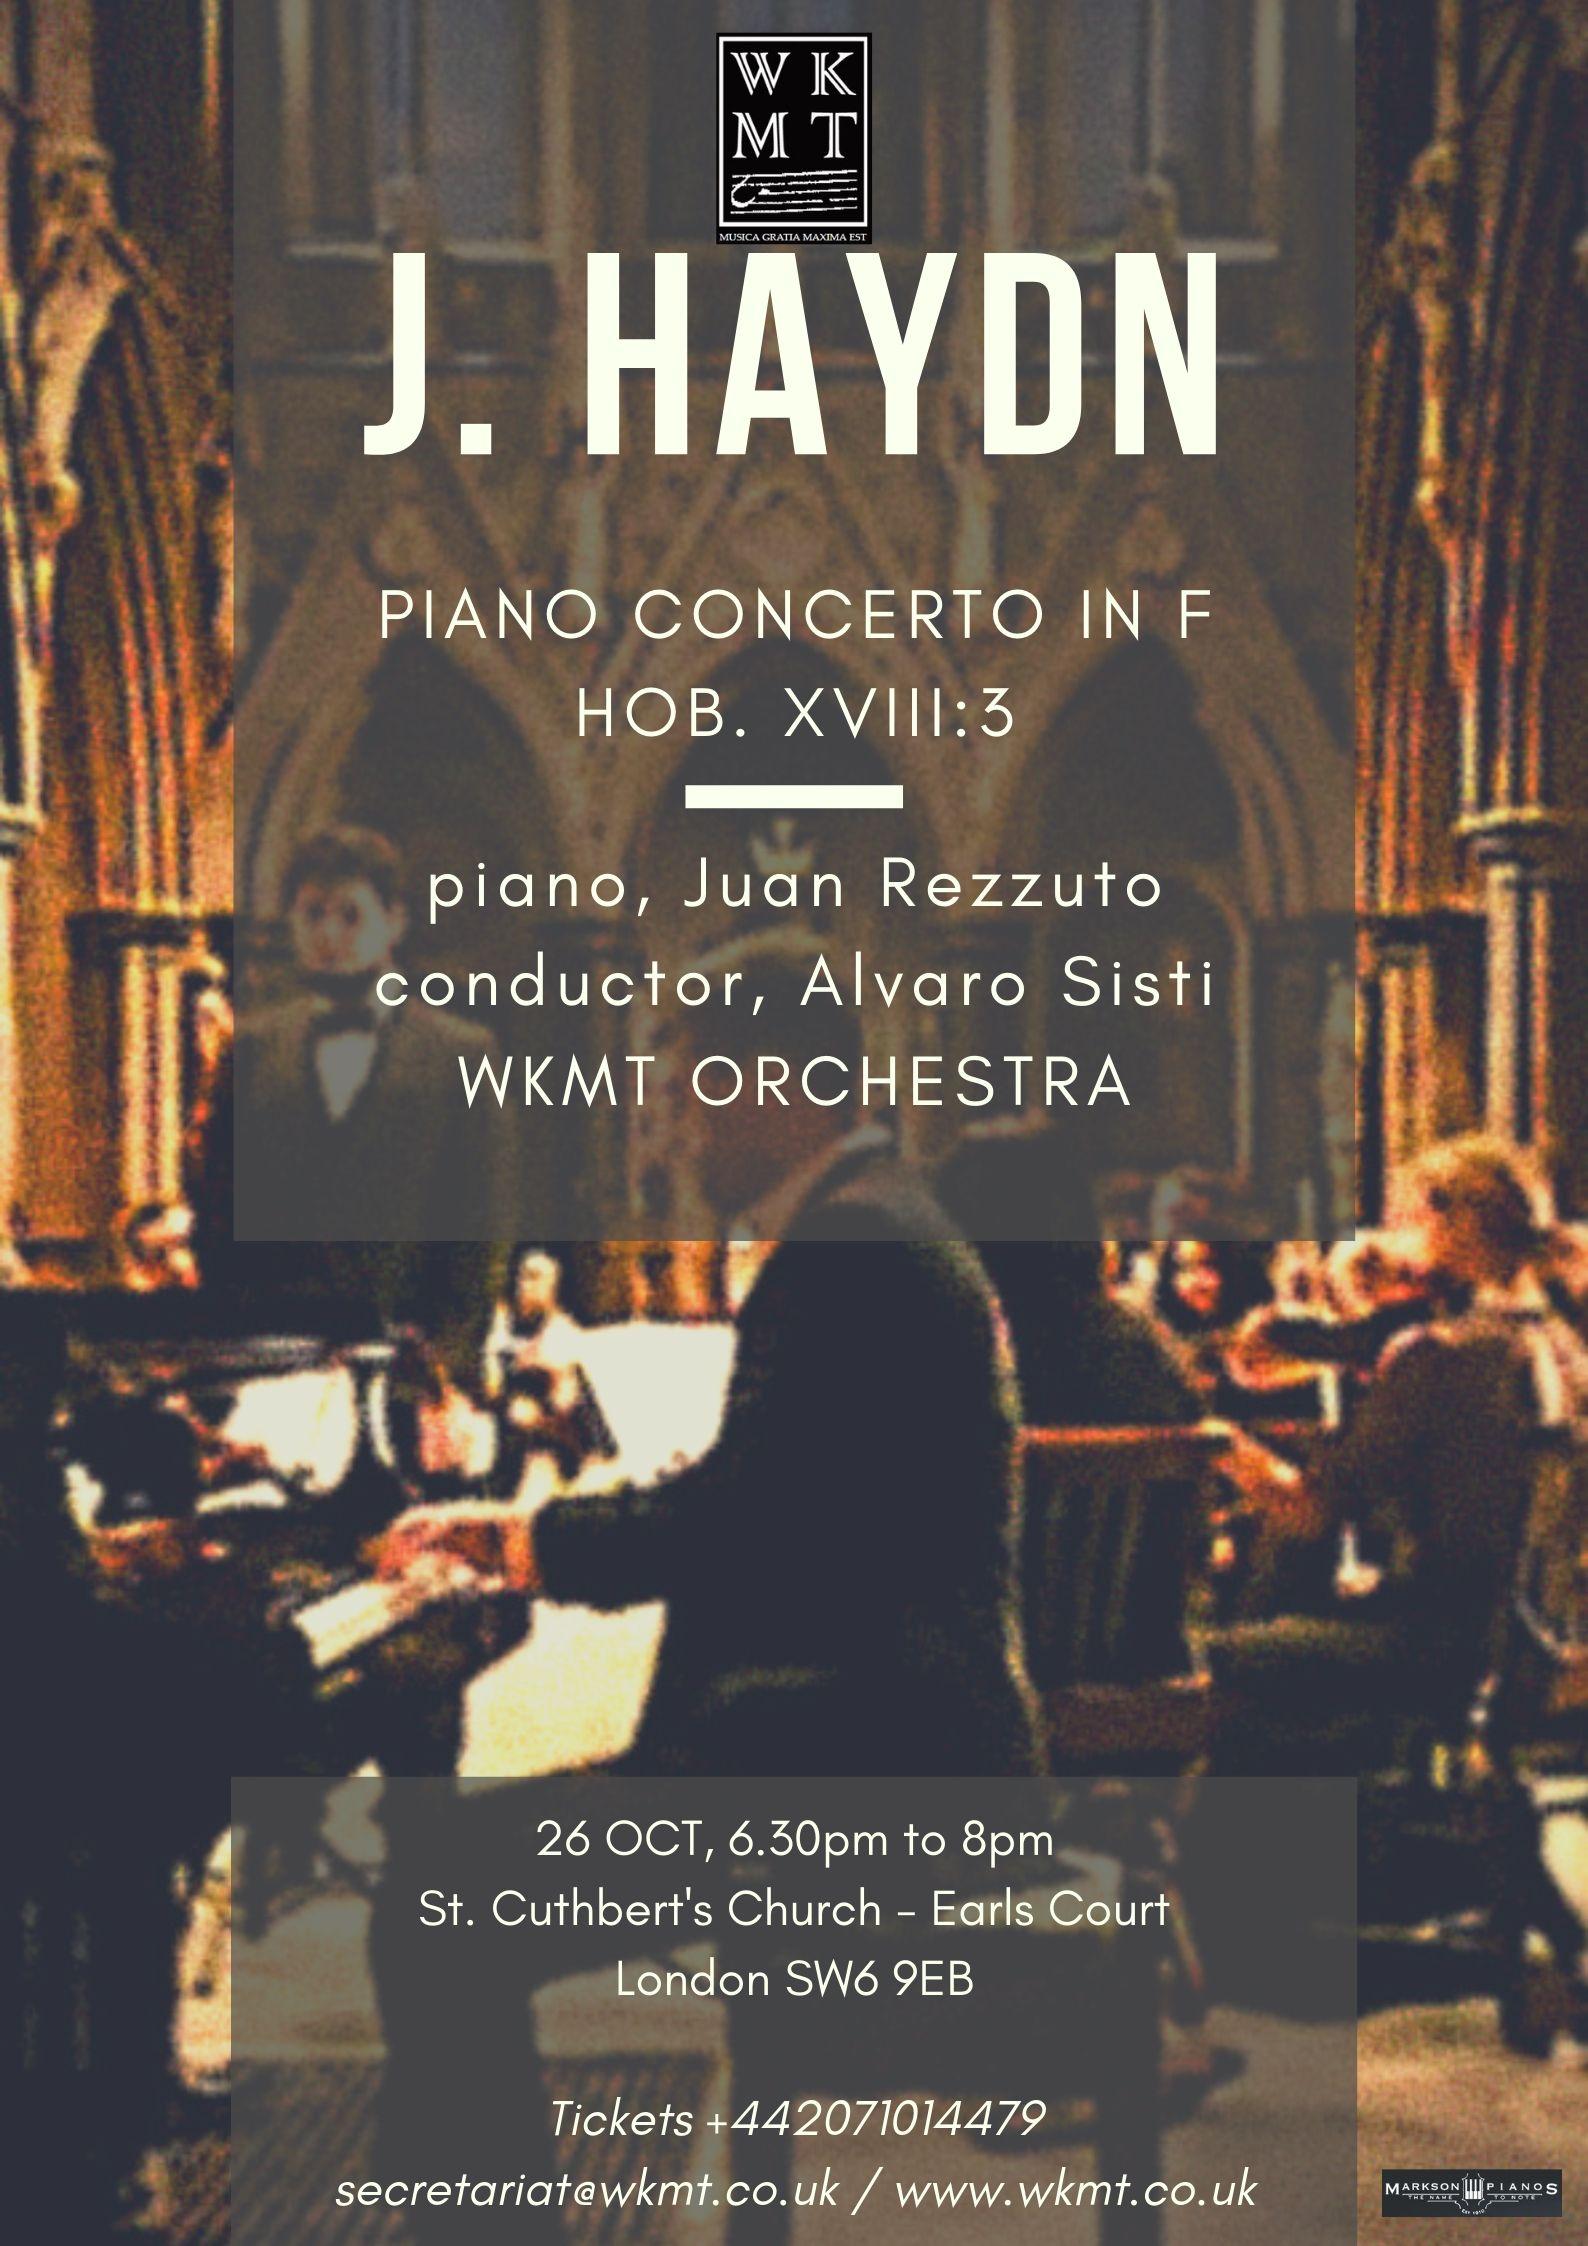 Haydn Piano Concerto in F Hob. XVIII:3